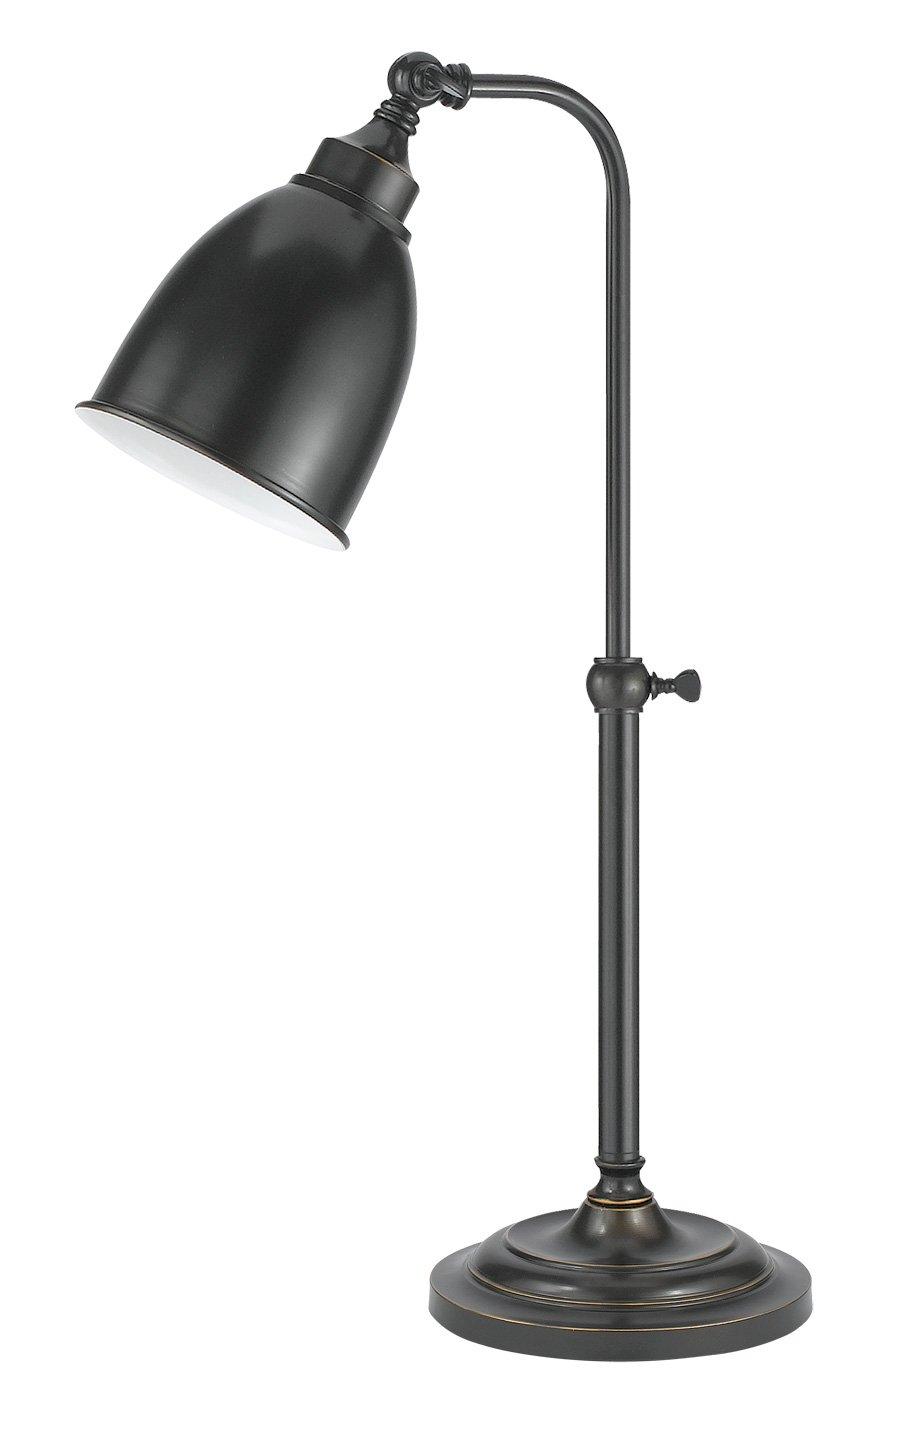 Cal Lighting BO-2032TB-DB Table Lamp with Metal Shades, Dark Bronze Finish